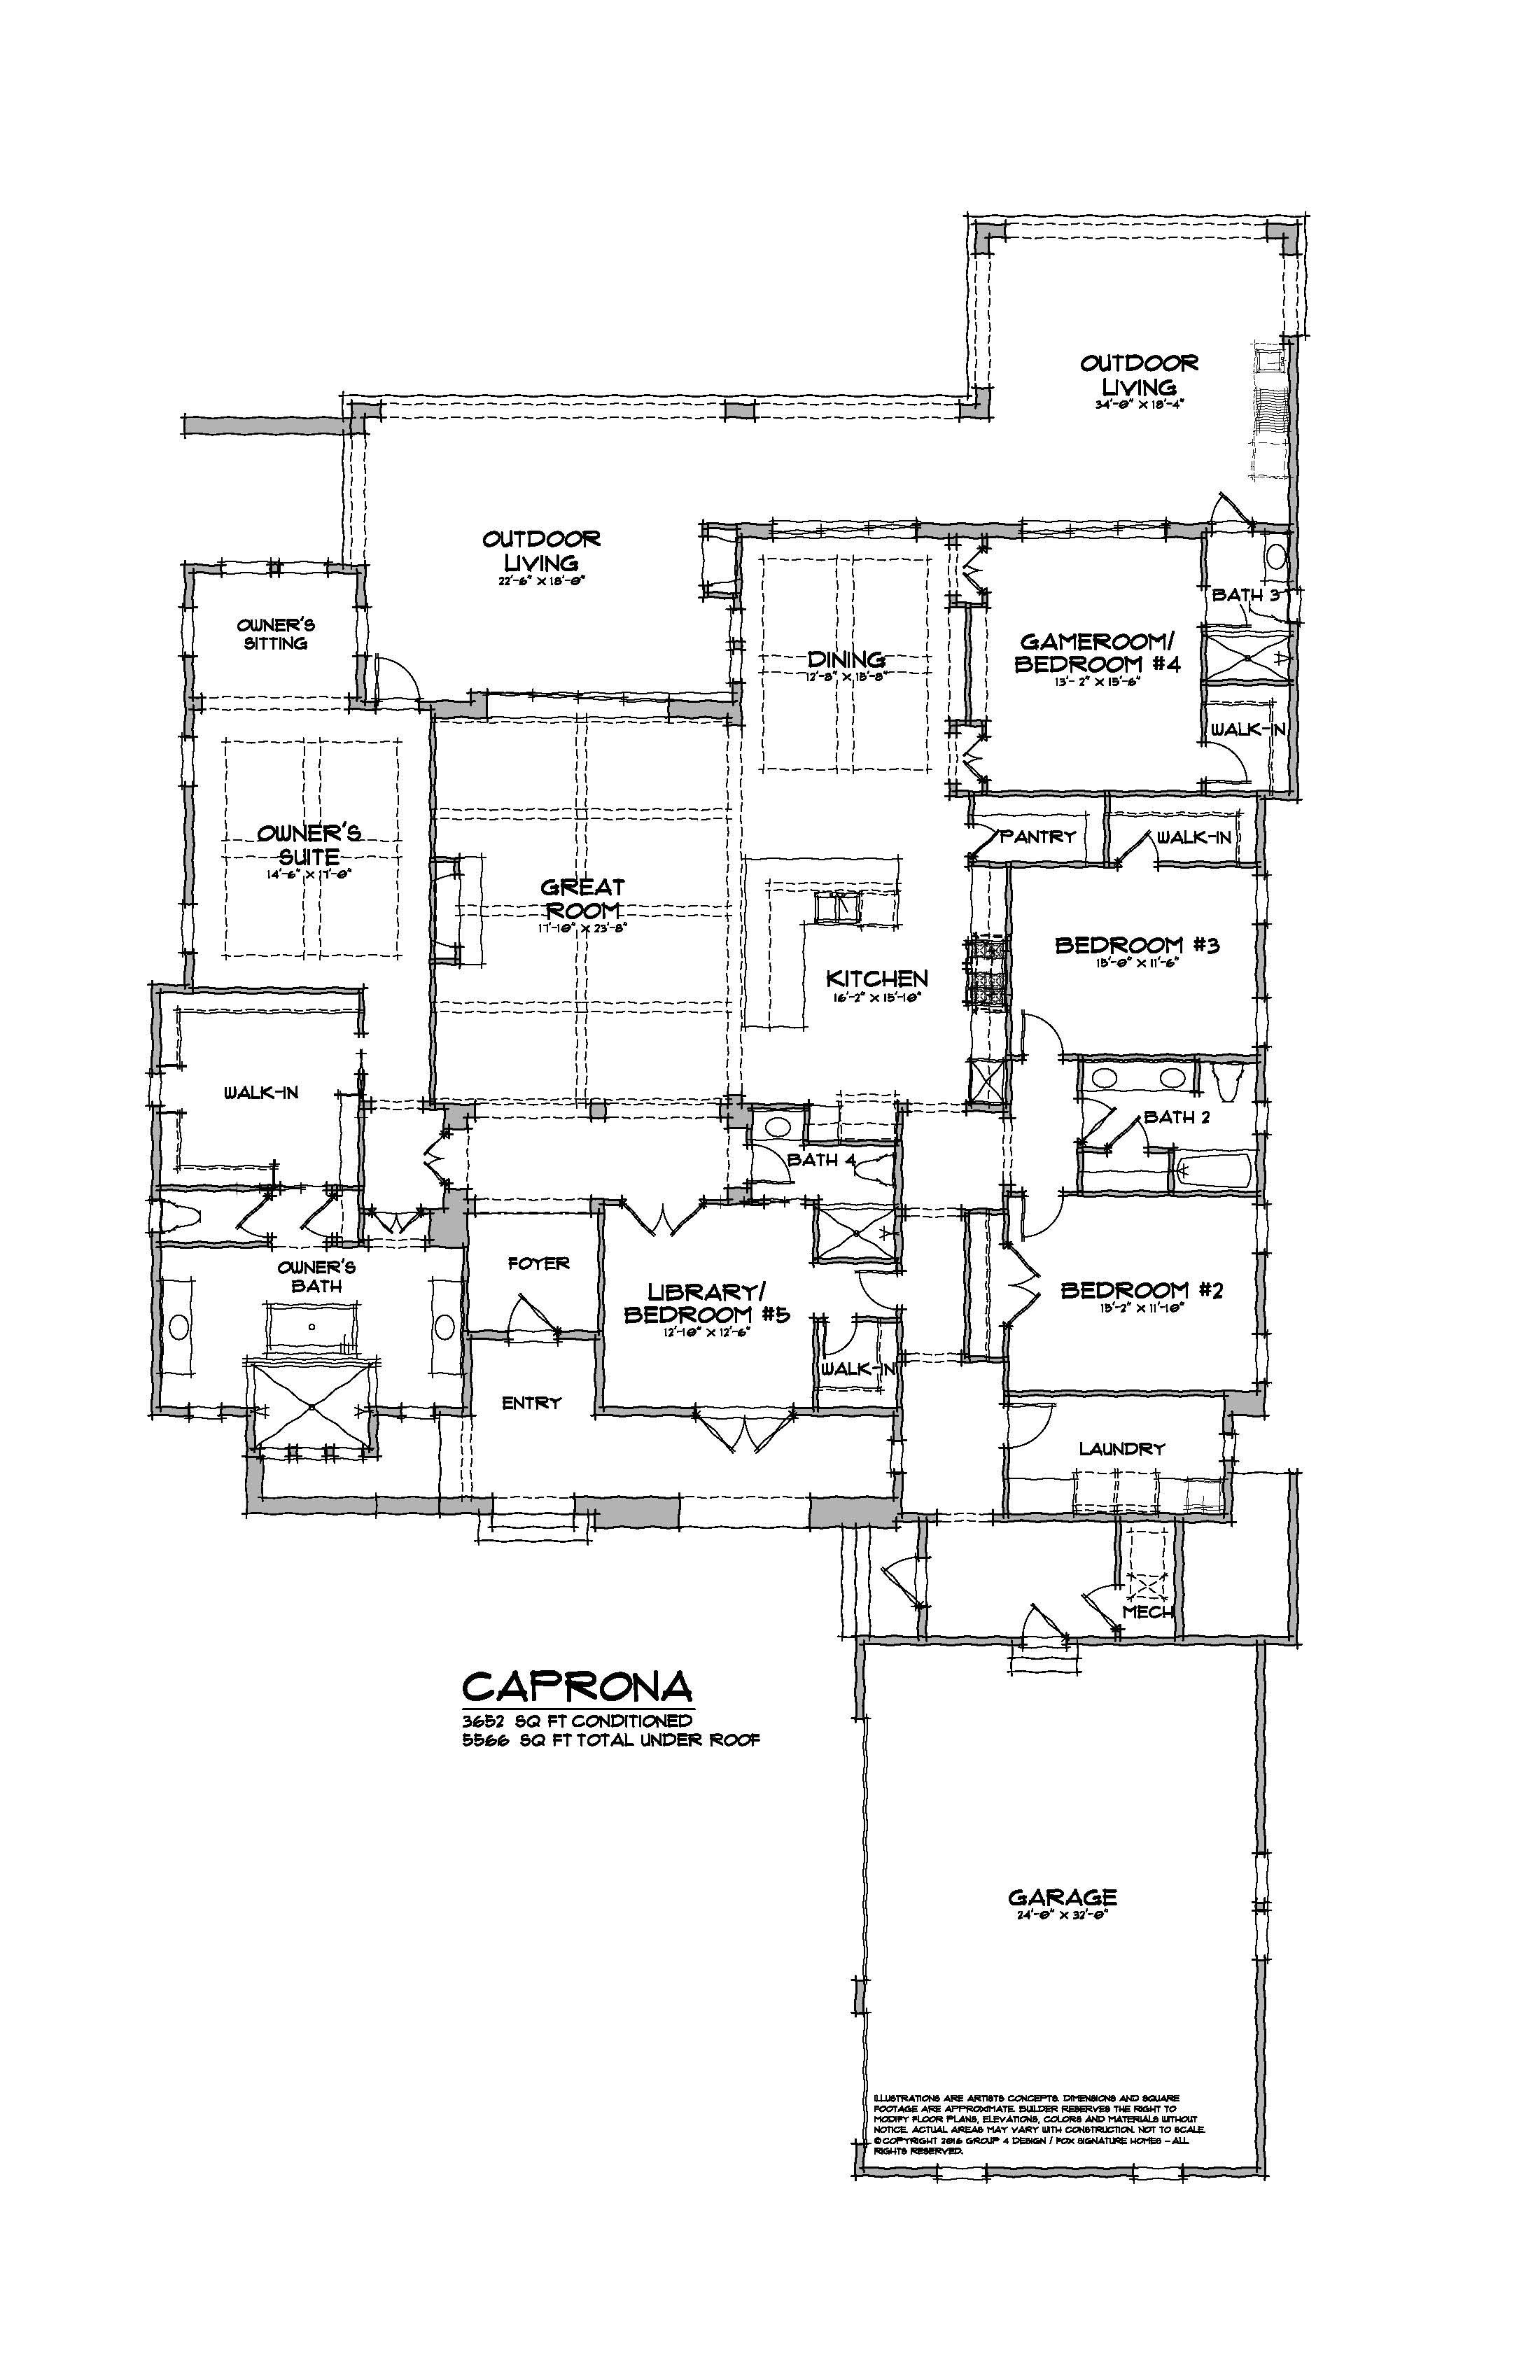 Caprona Floorplan.JPG